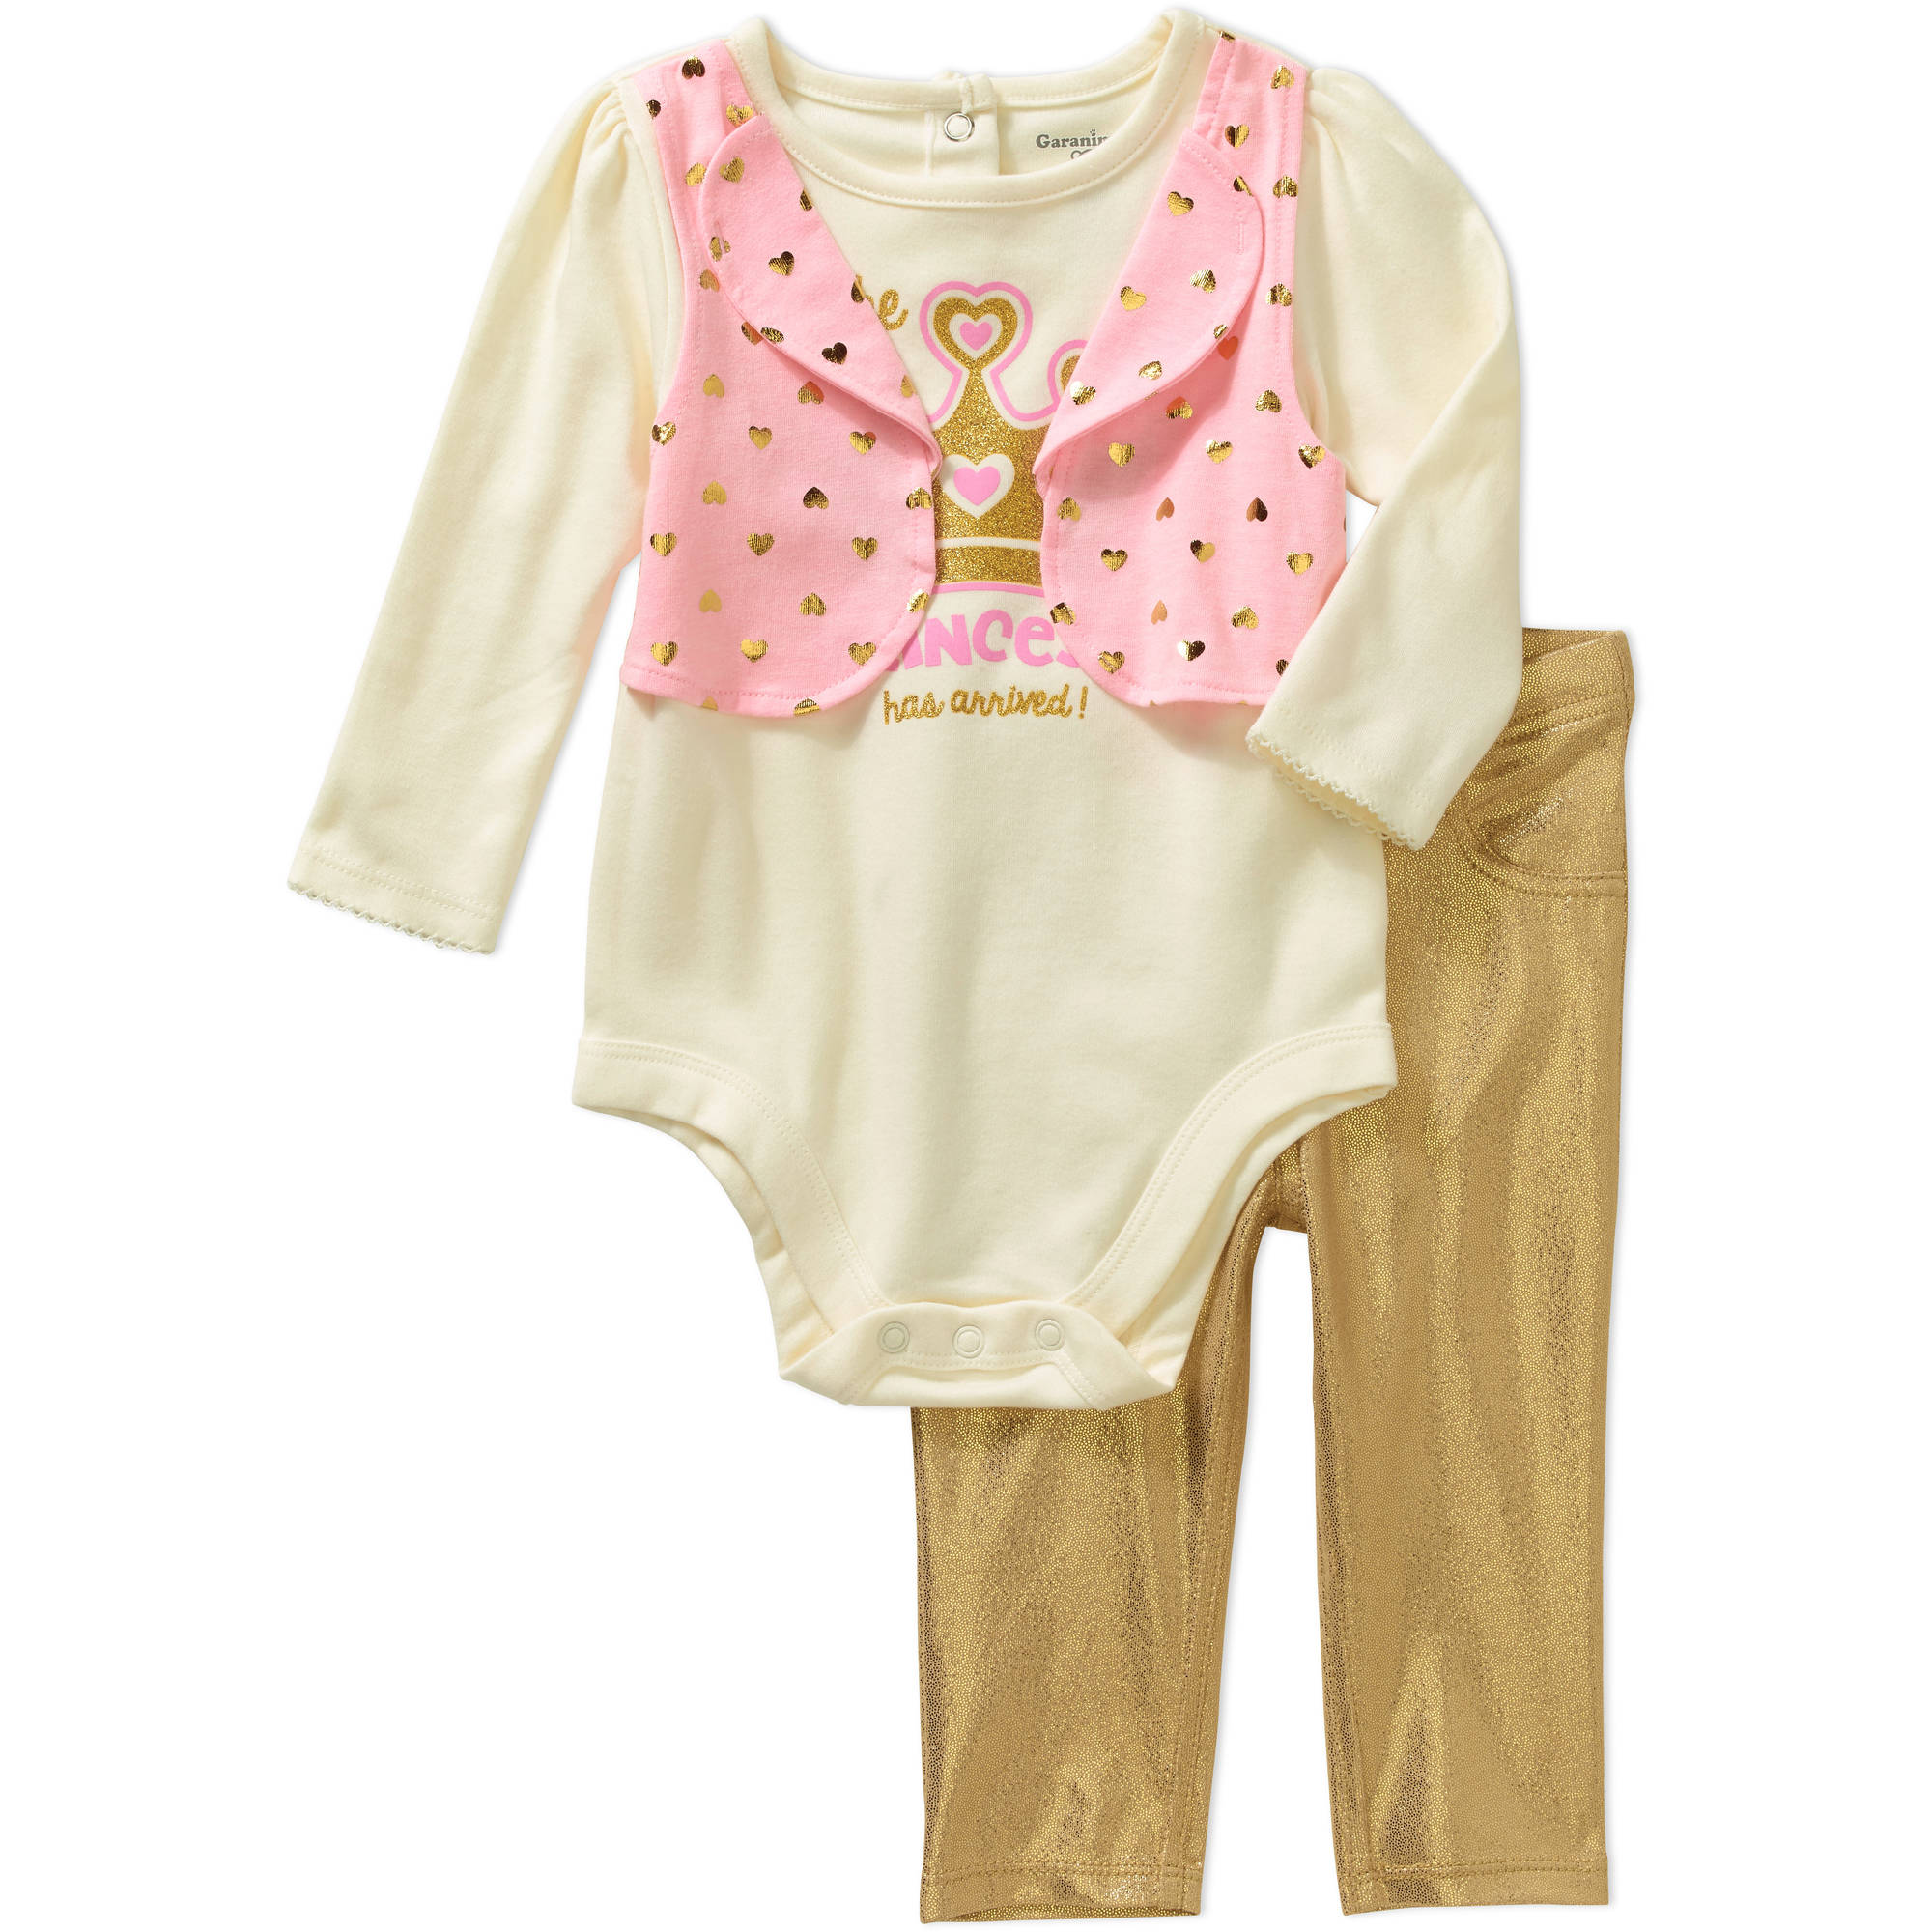 Garanimals Newborn Baby Girls' Twofer Faux Vest Bodysuit and Jeggings 2-Piece Outfit Set